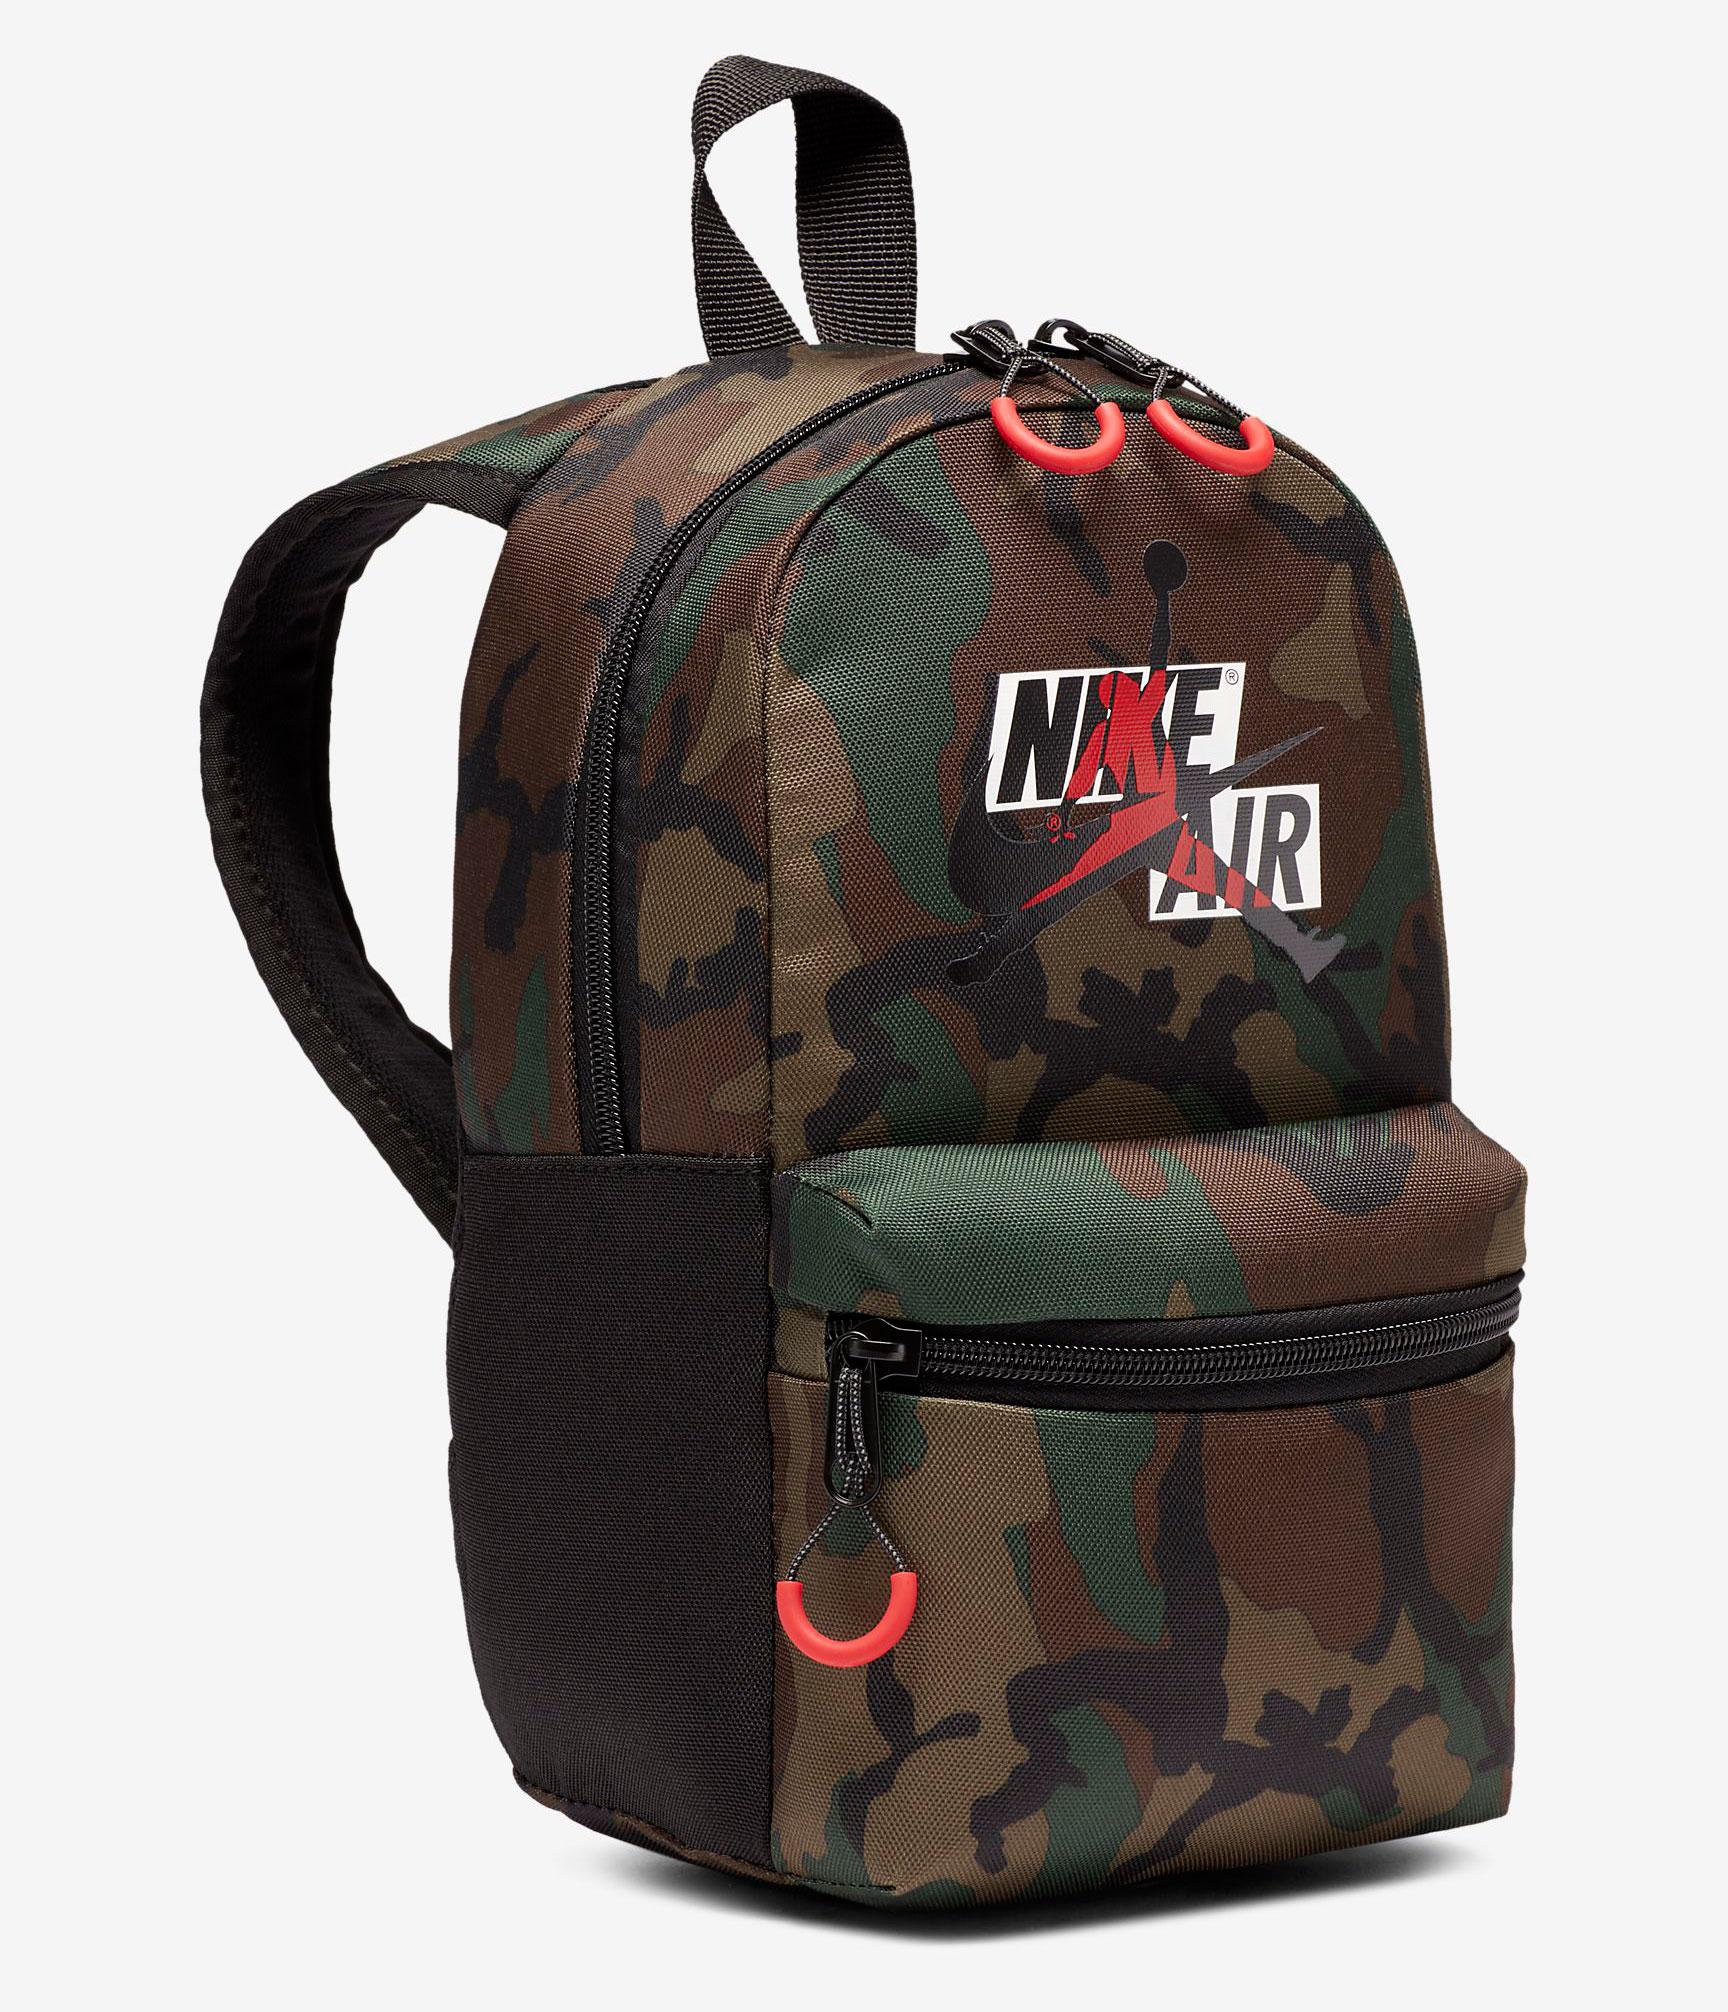 air-jordan-1-dark-mocha-small-backpack-match